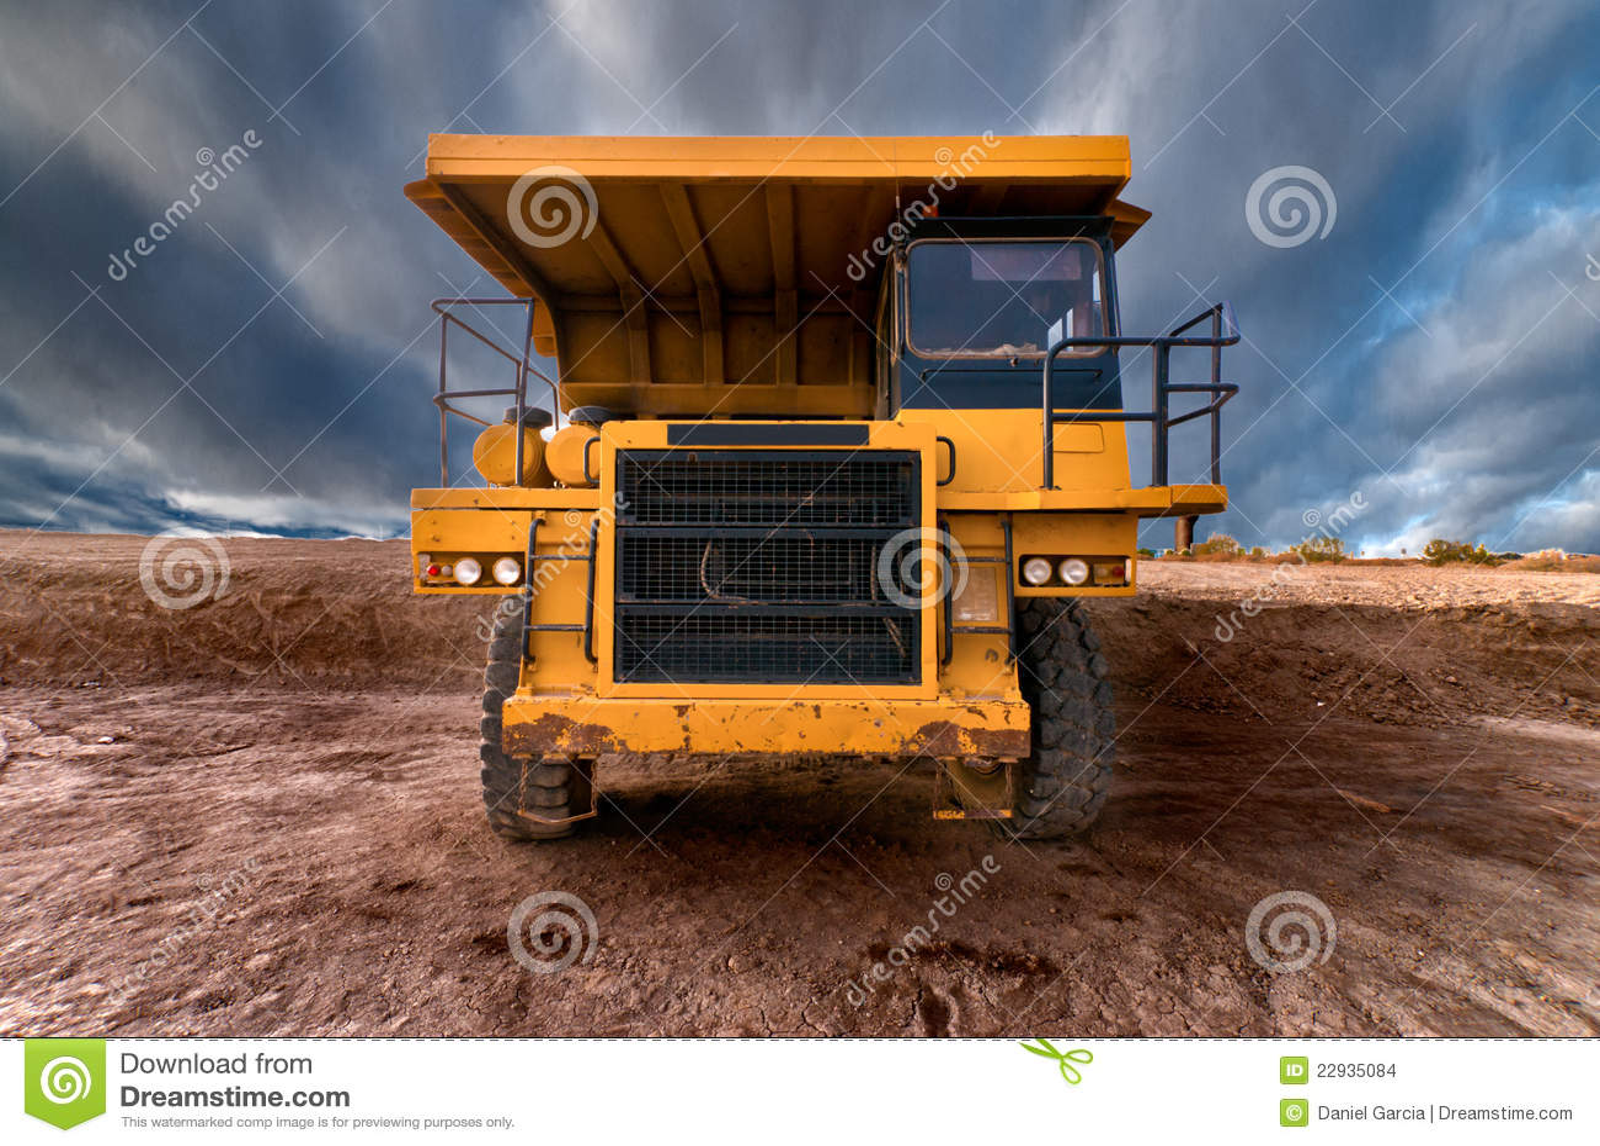 large mining dump trucks - Huge uto-dump Yellow Mining ruck Stock Images - Image: 22935084